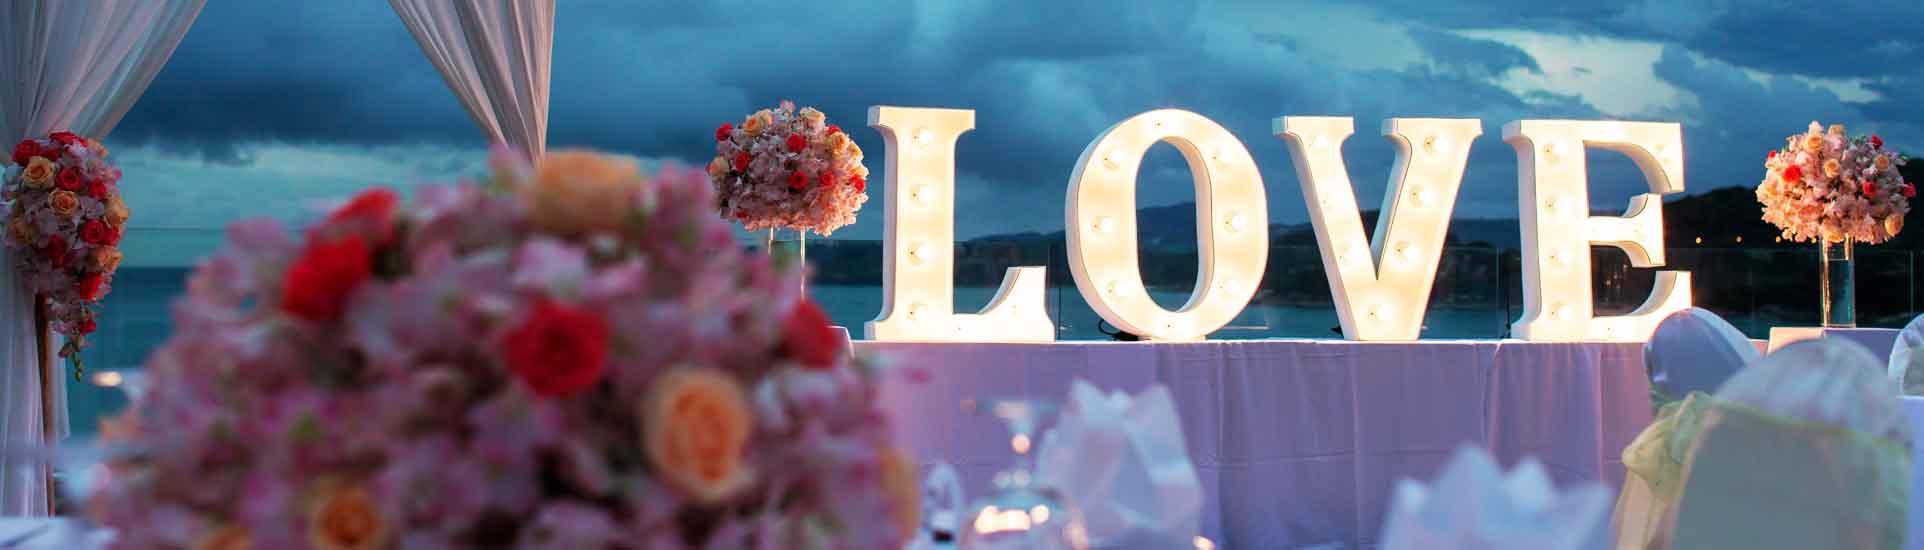 rhodes-weddings-letter-wedding-servides-dodecanese-islands-header